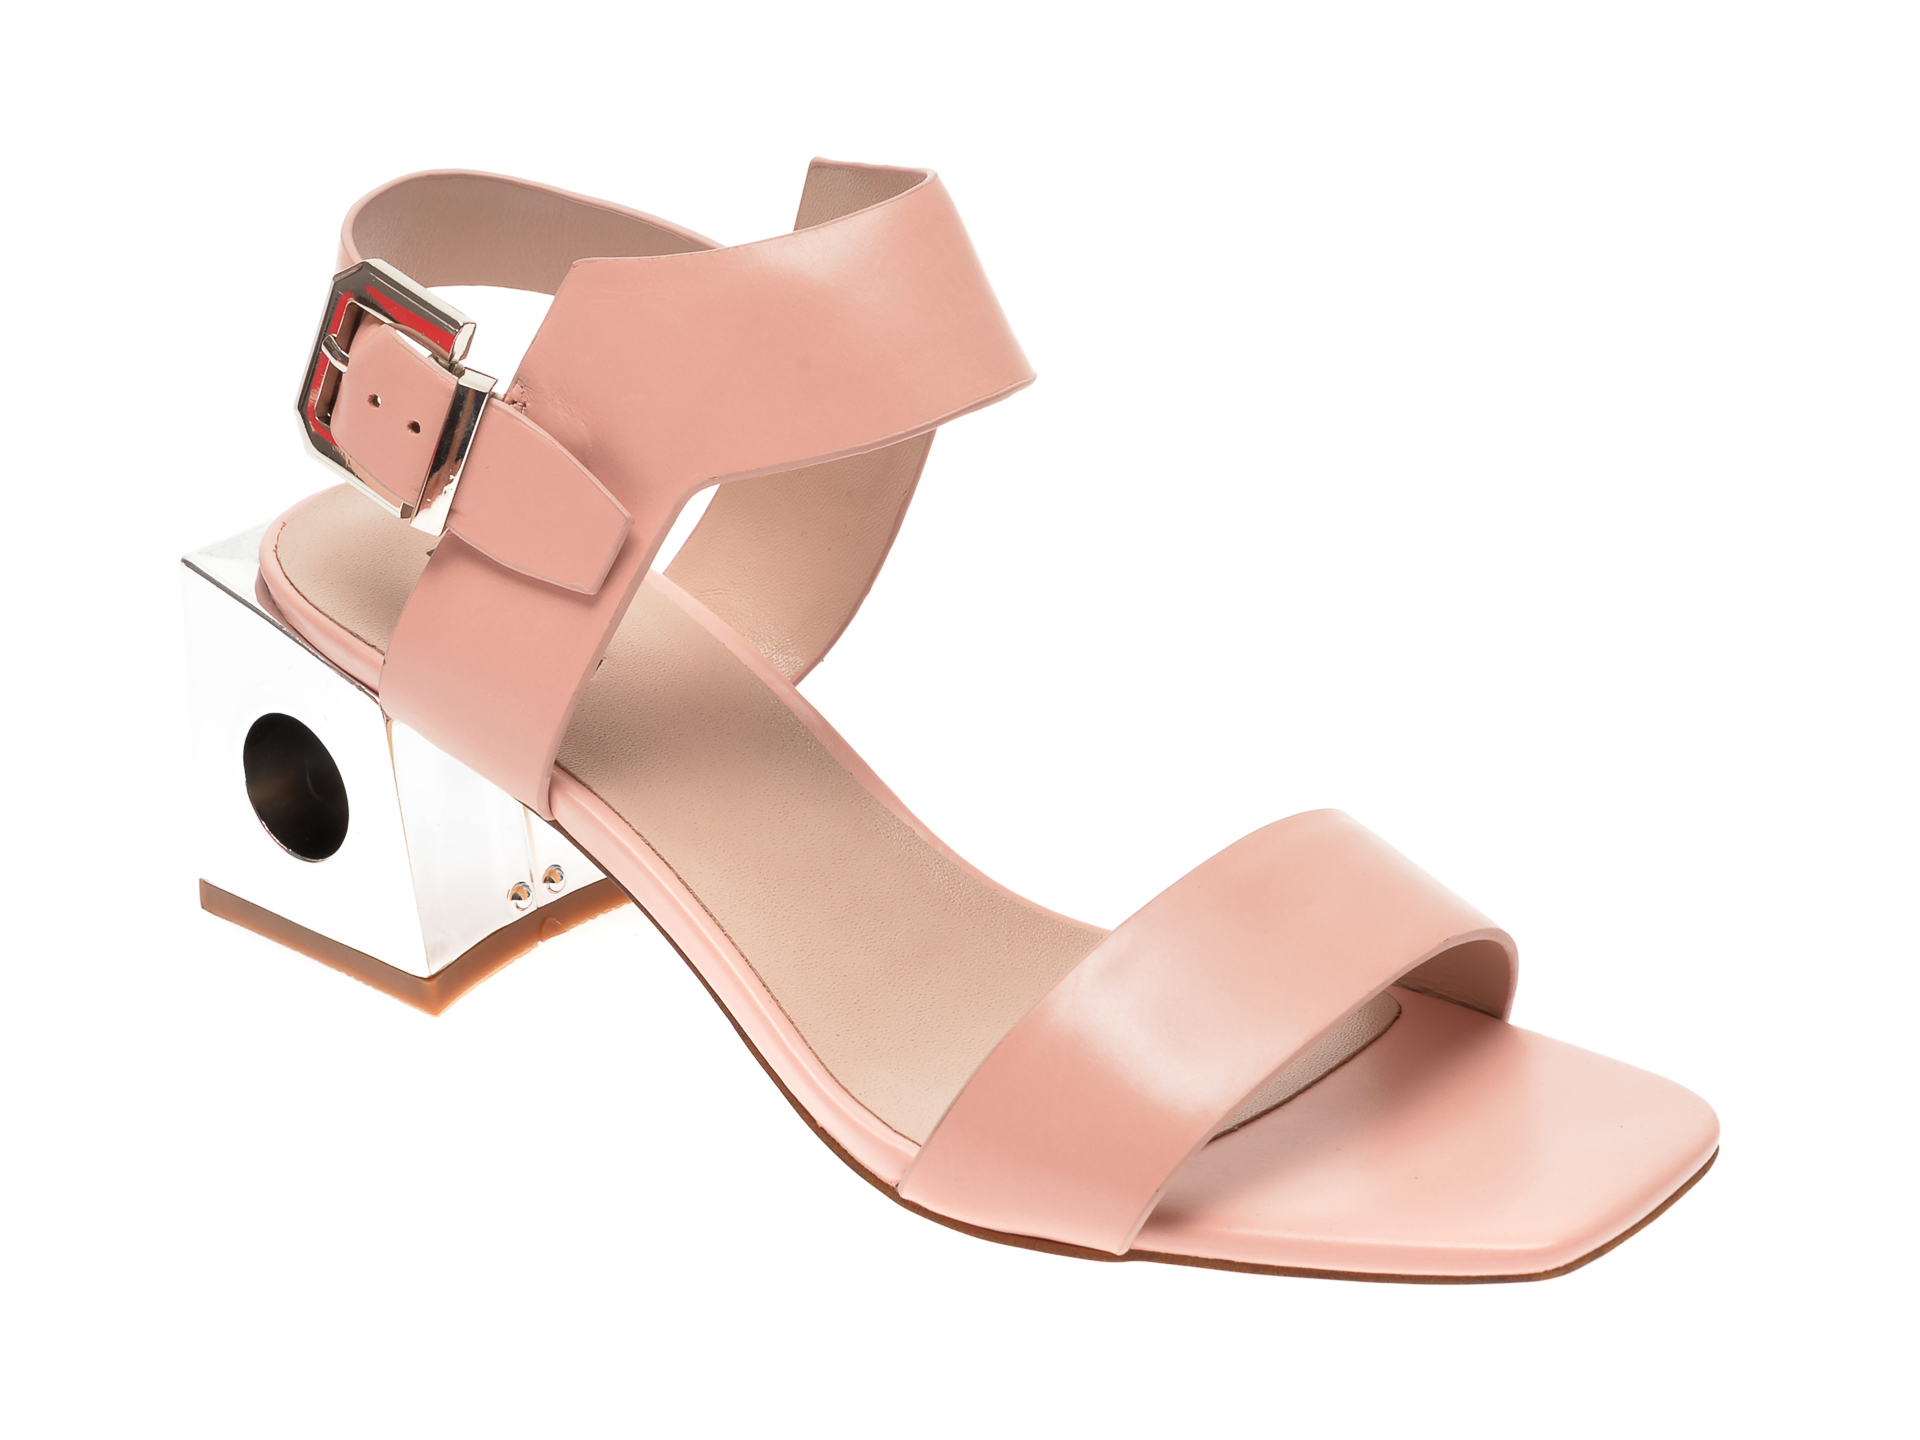 Sandale EPICA roz, 6505053, din piele naturala